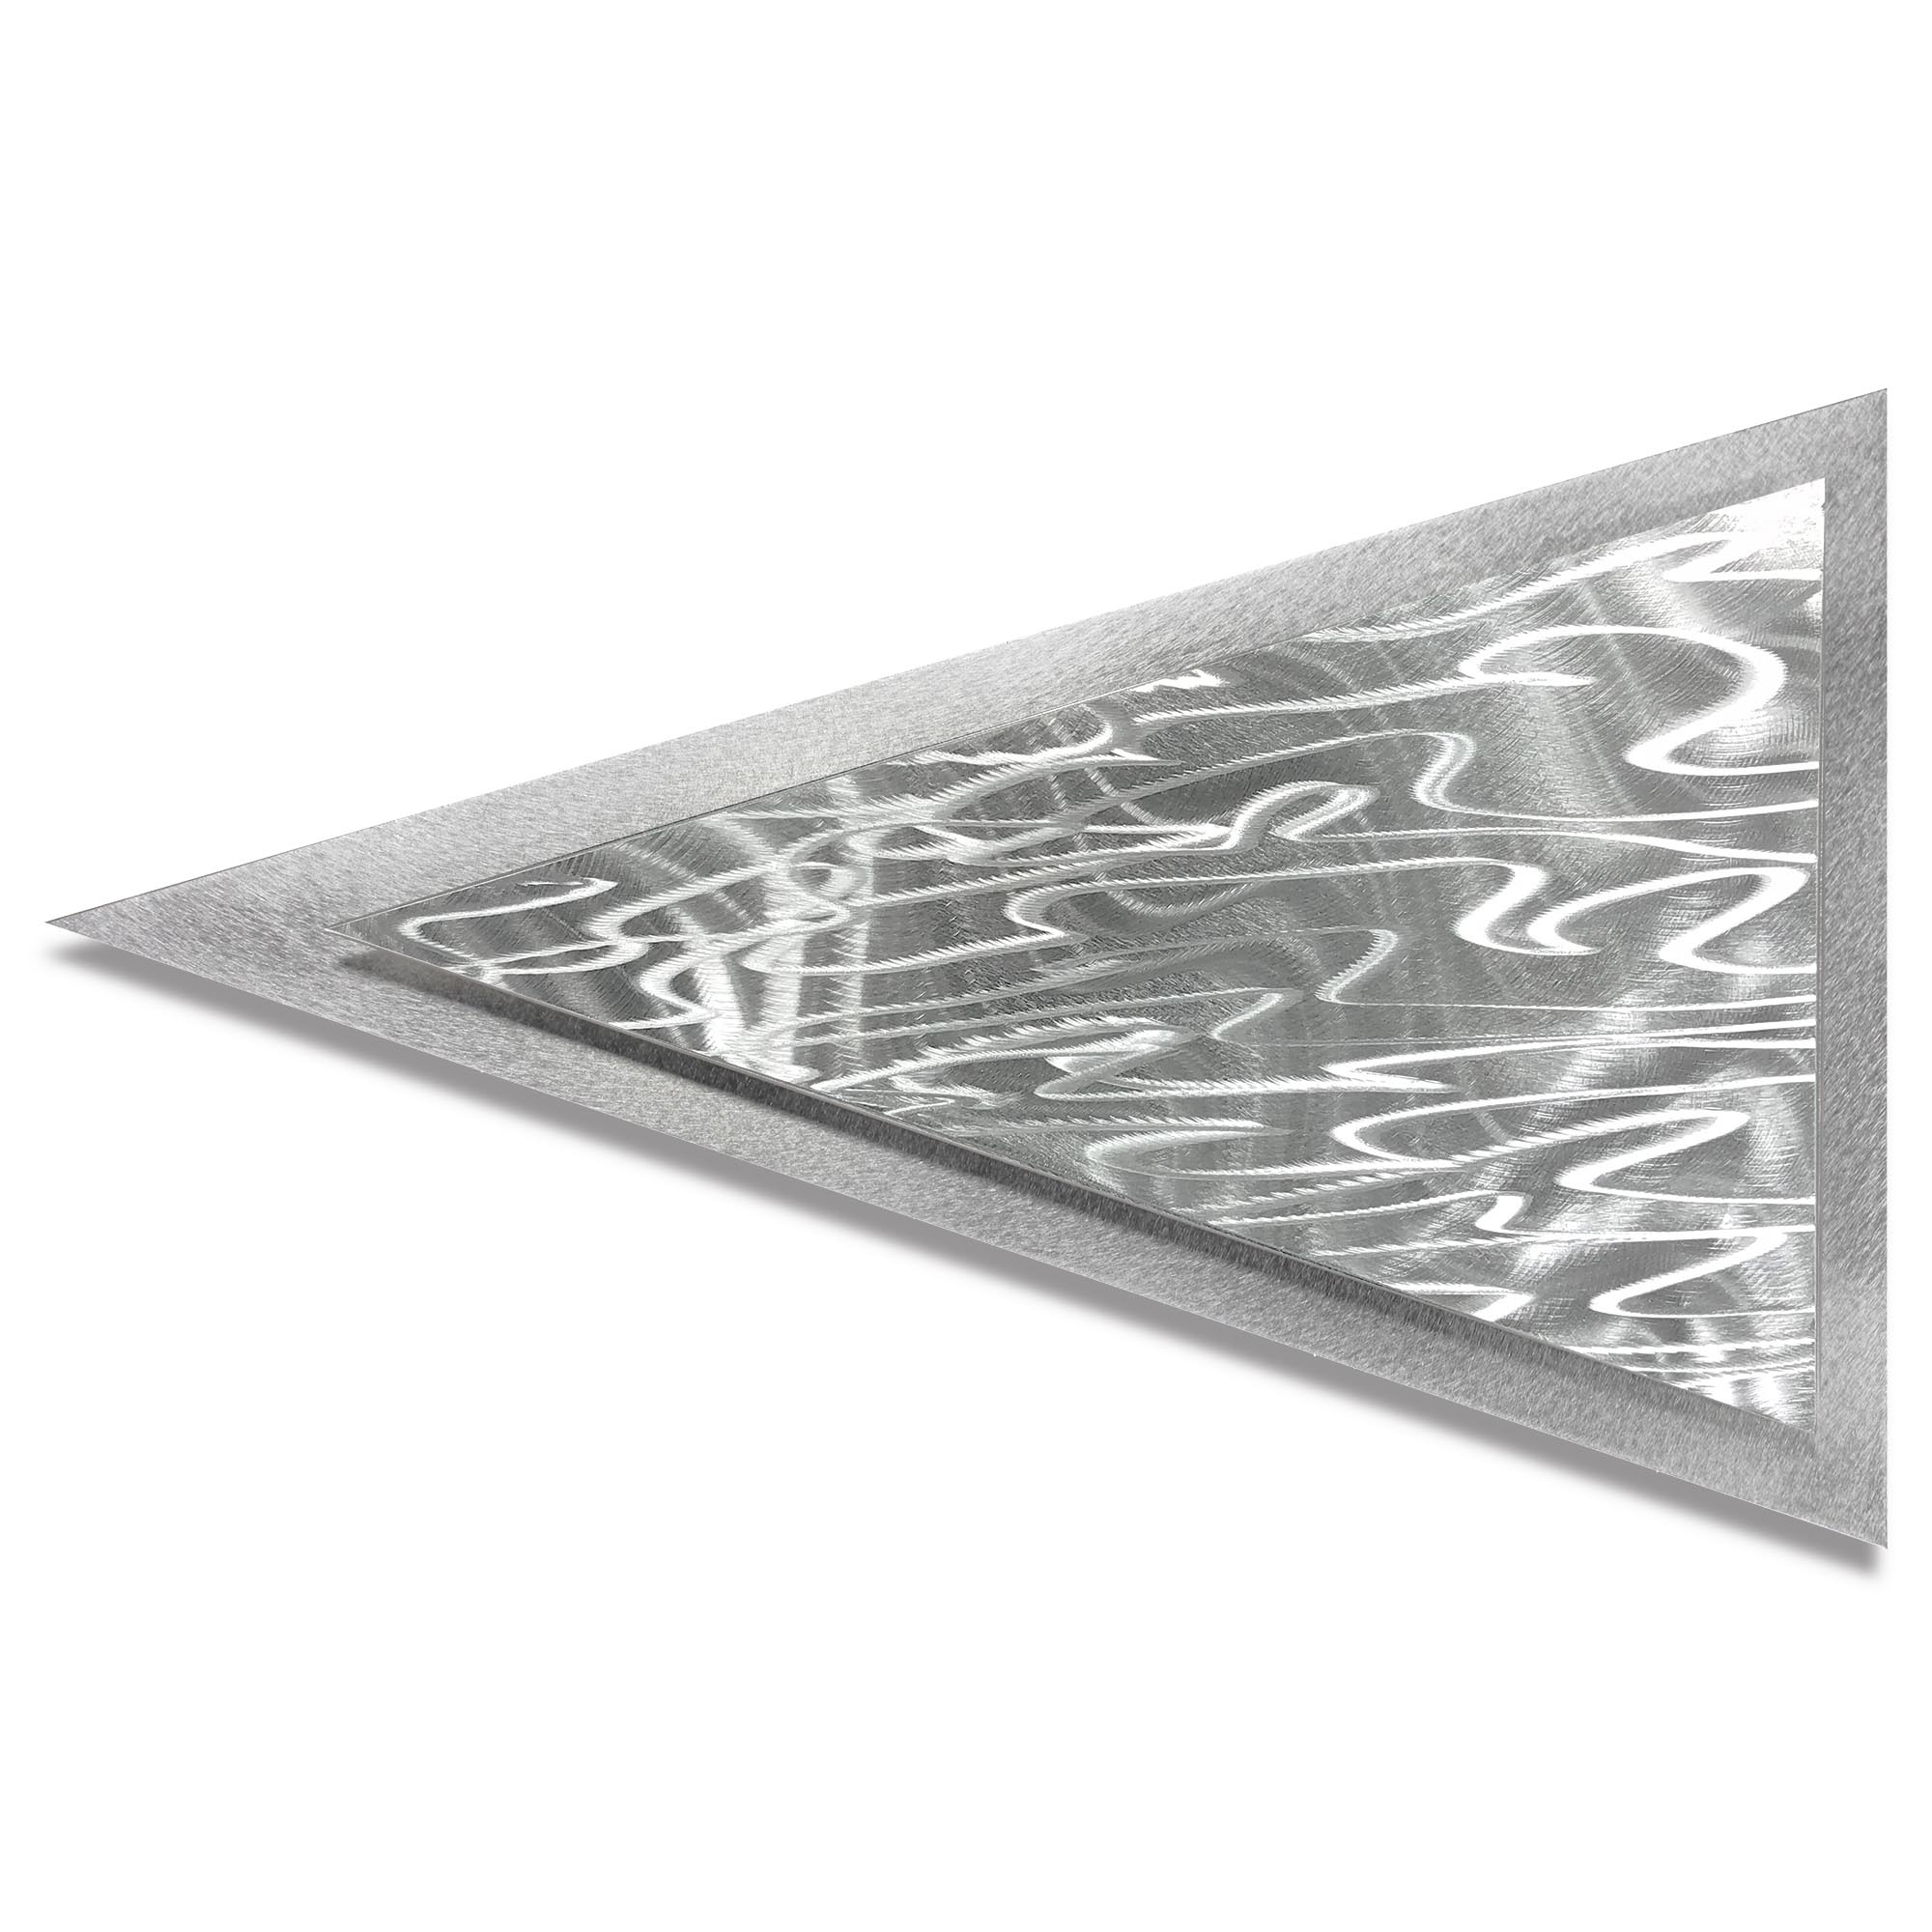 Helena Martin 'Currents Arrow' 24in x 15in Modern Metal Art on Ground Metal